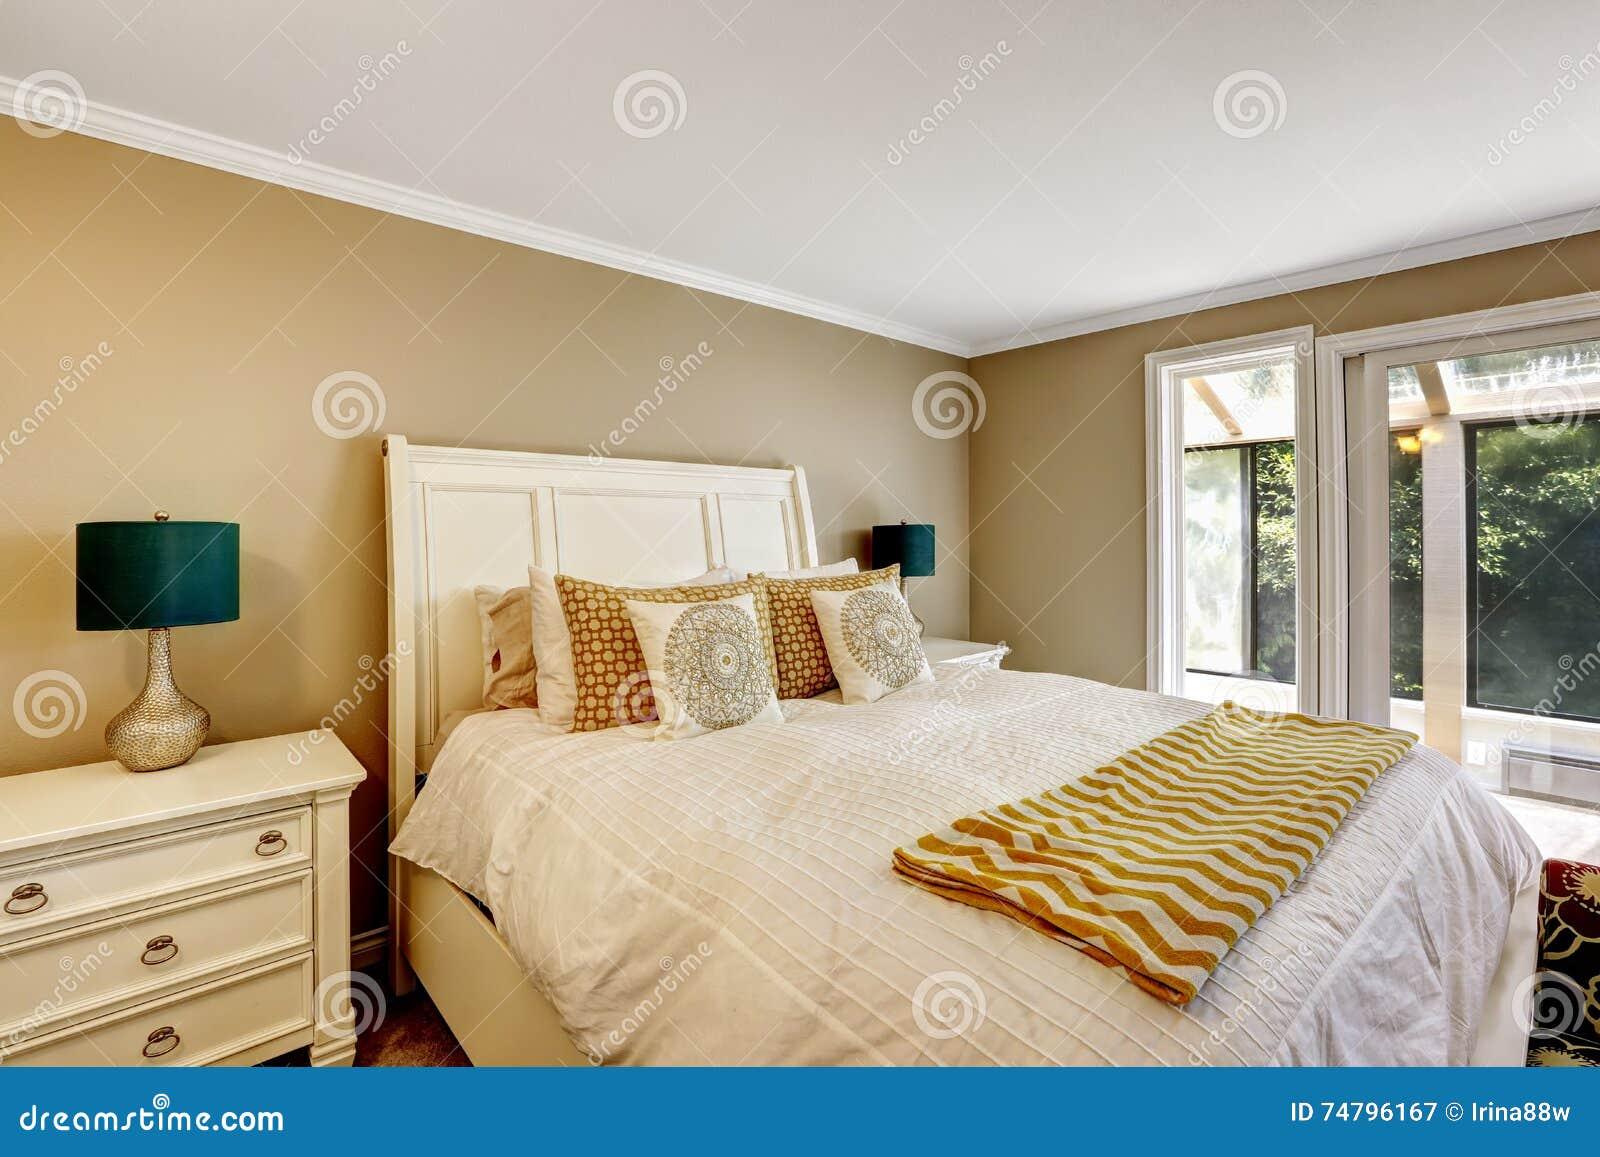 elegante slaapkamer in amerikaanse stijl met wit tweepersoonsbed, Meubels Ideeën